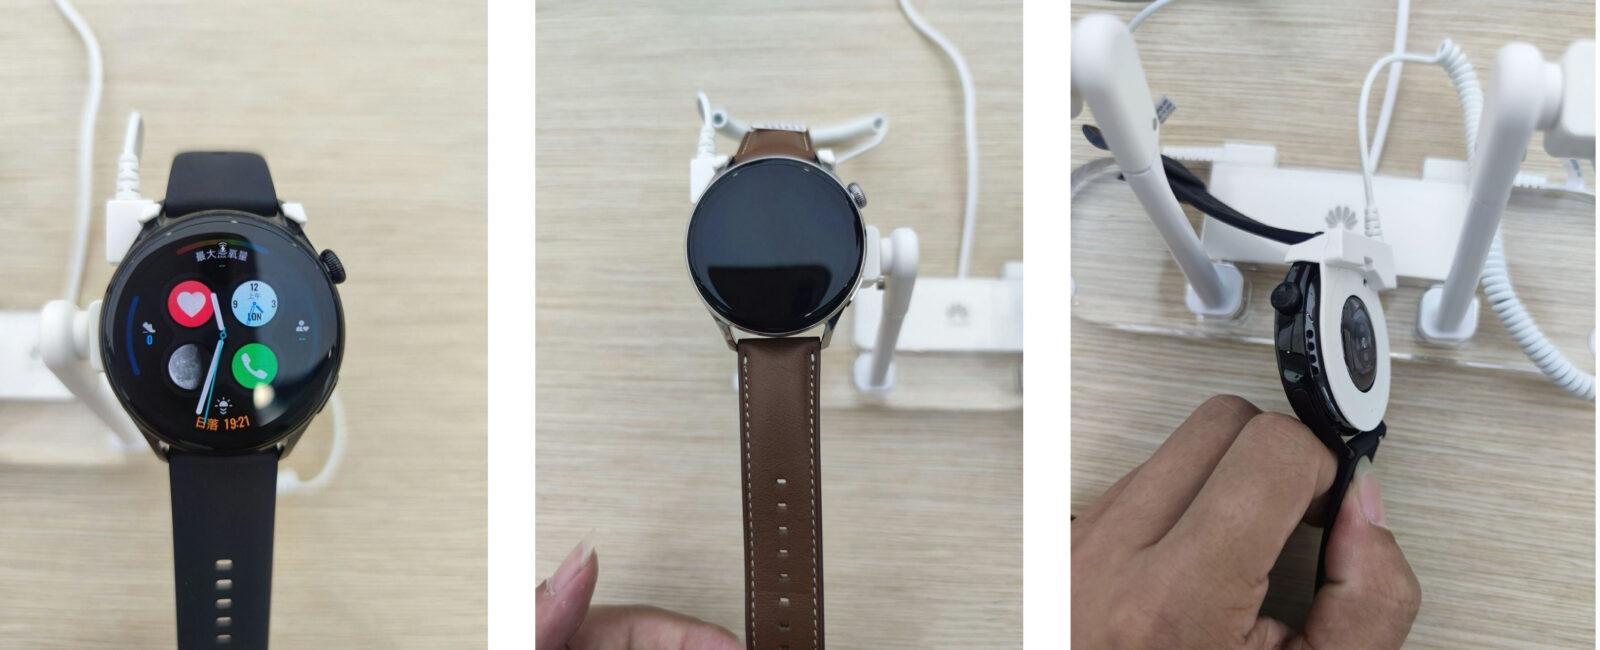 Dopo gli smartphone, Huawei integrerà Harmony OS nei suoi orologi